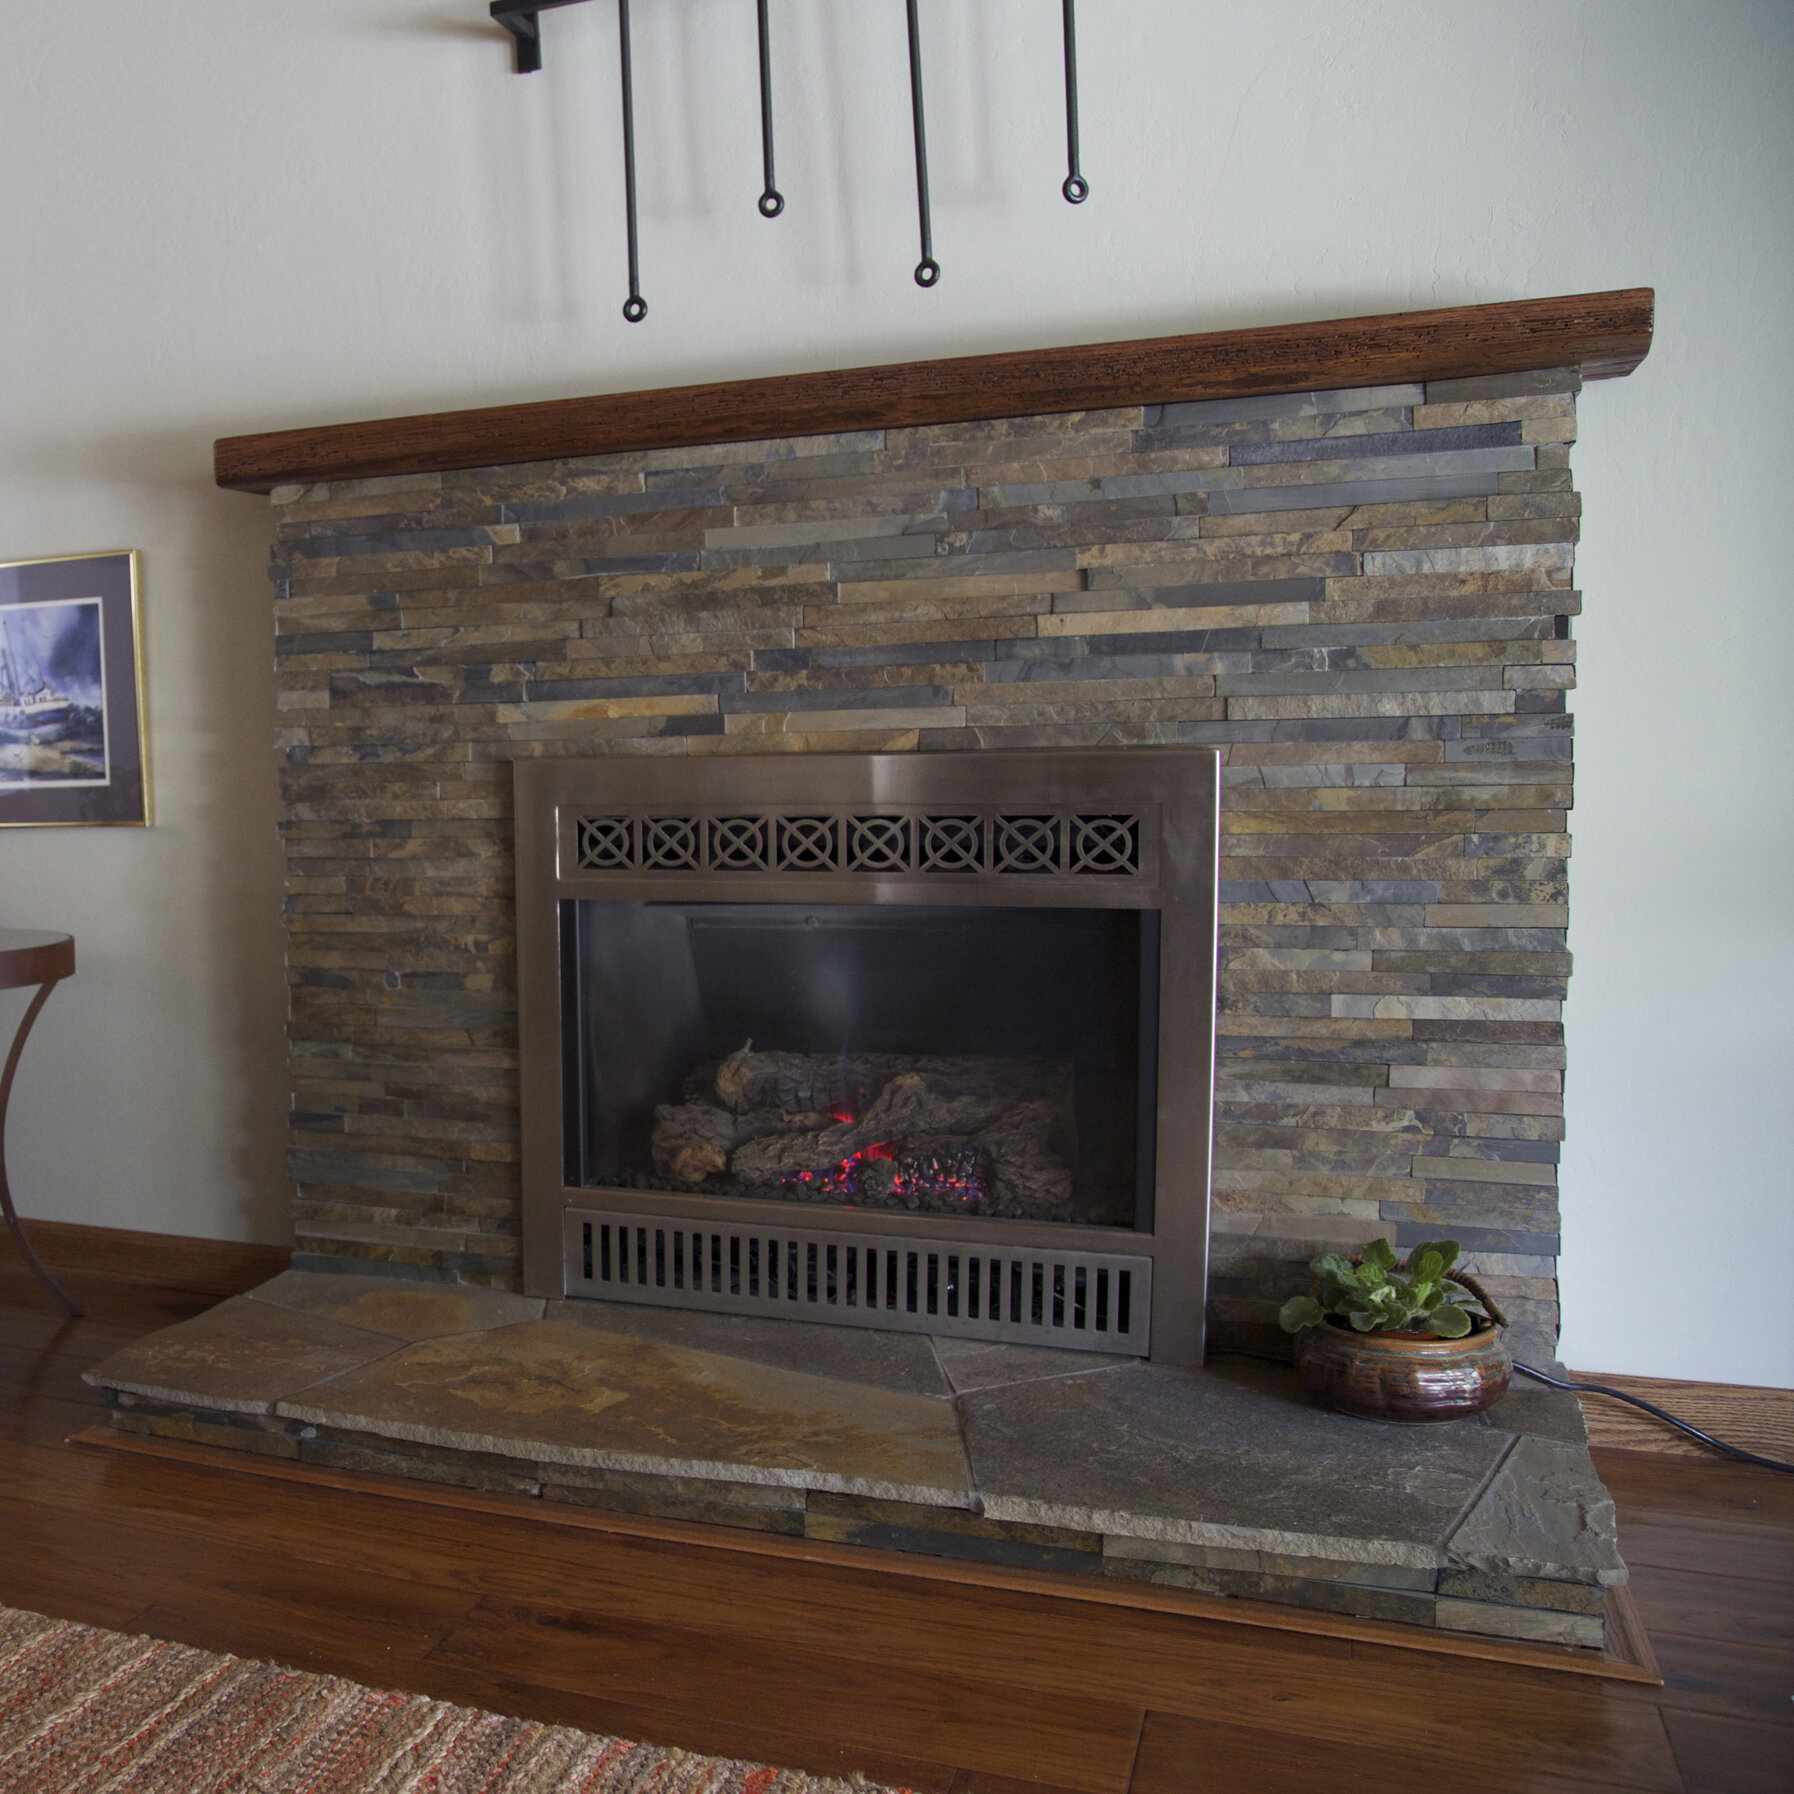 kellani cladding 23 x 4 natural stone splitface tile wayfair rh wayfair com split face stone tile fireplace